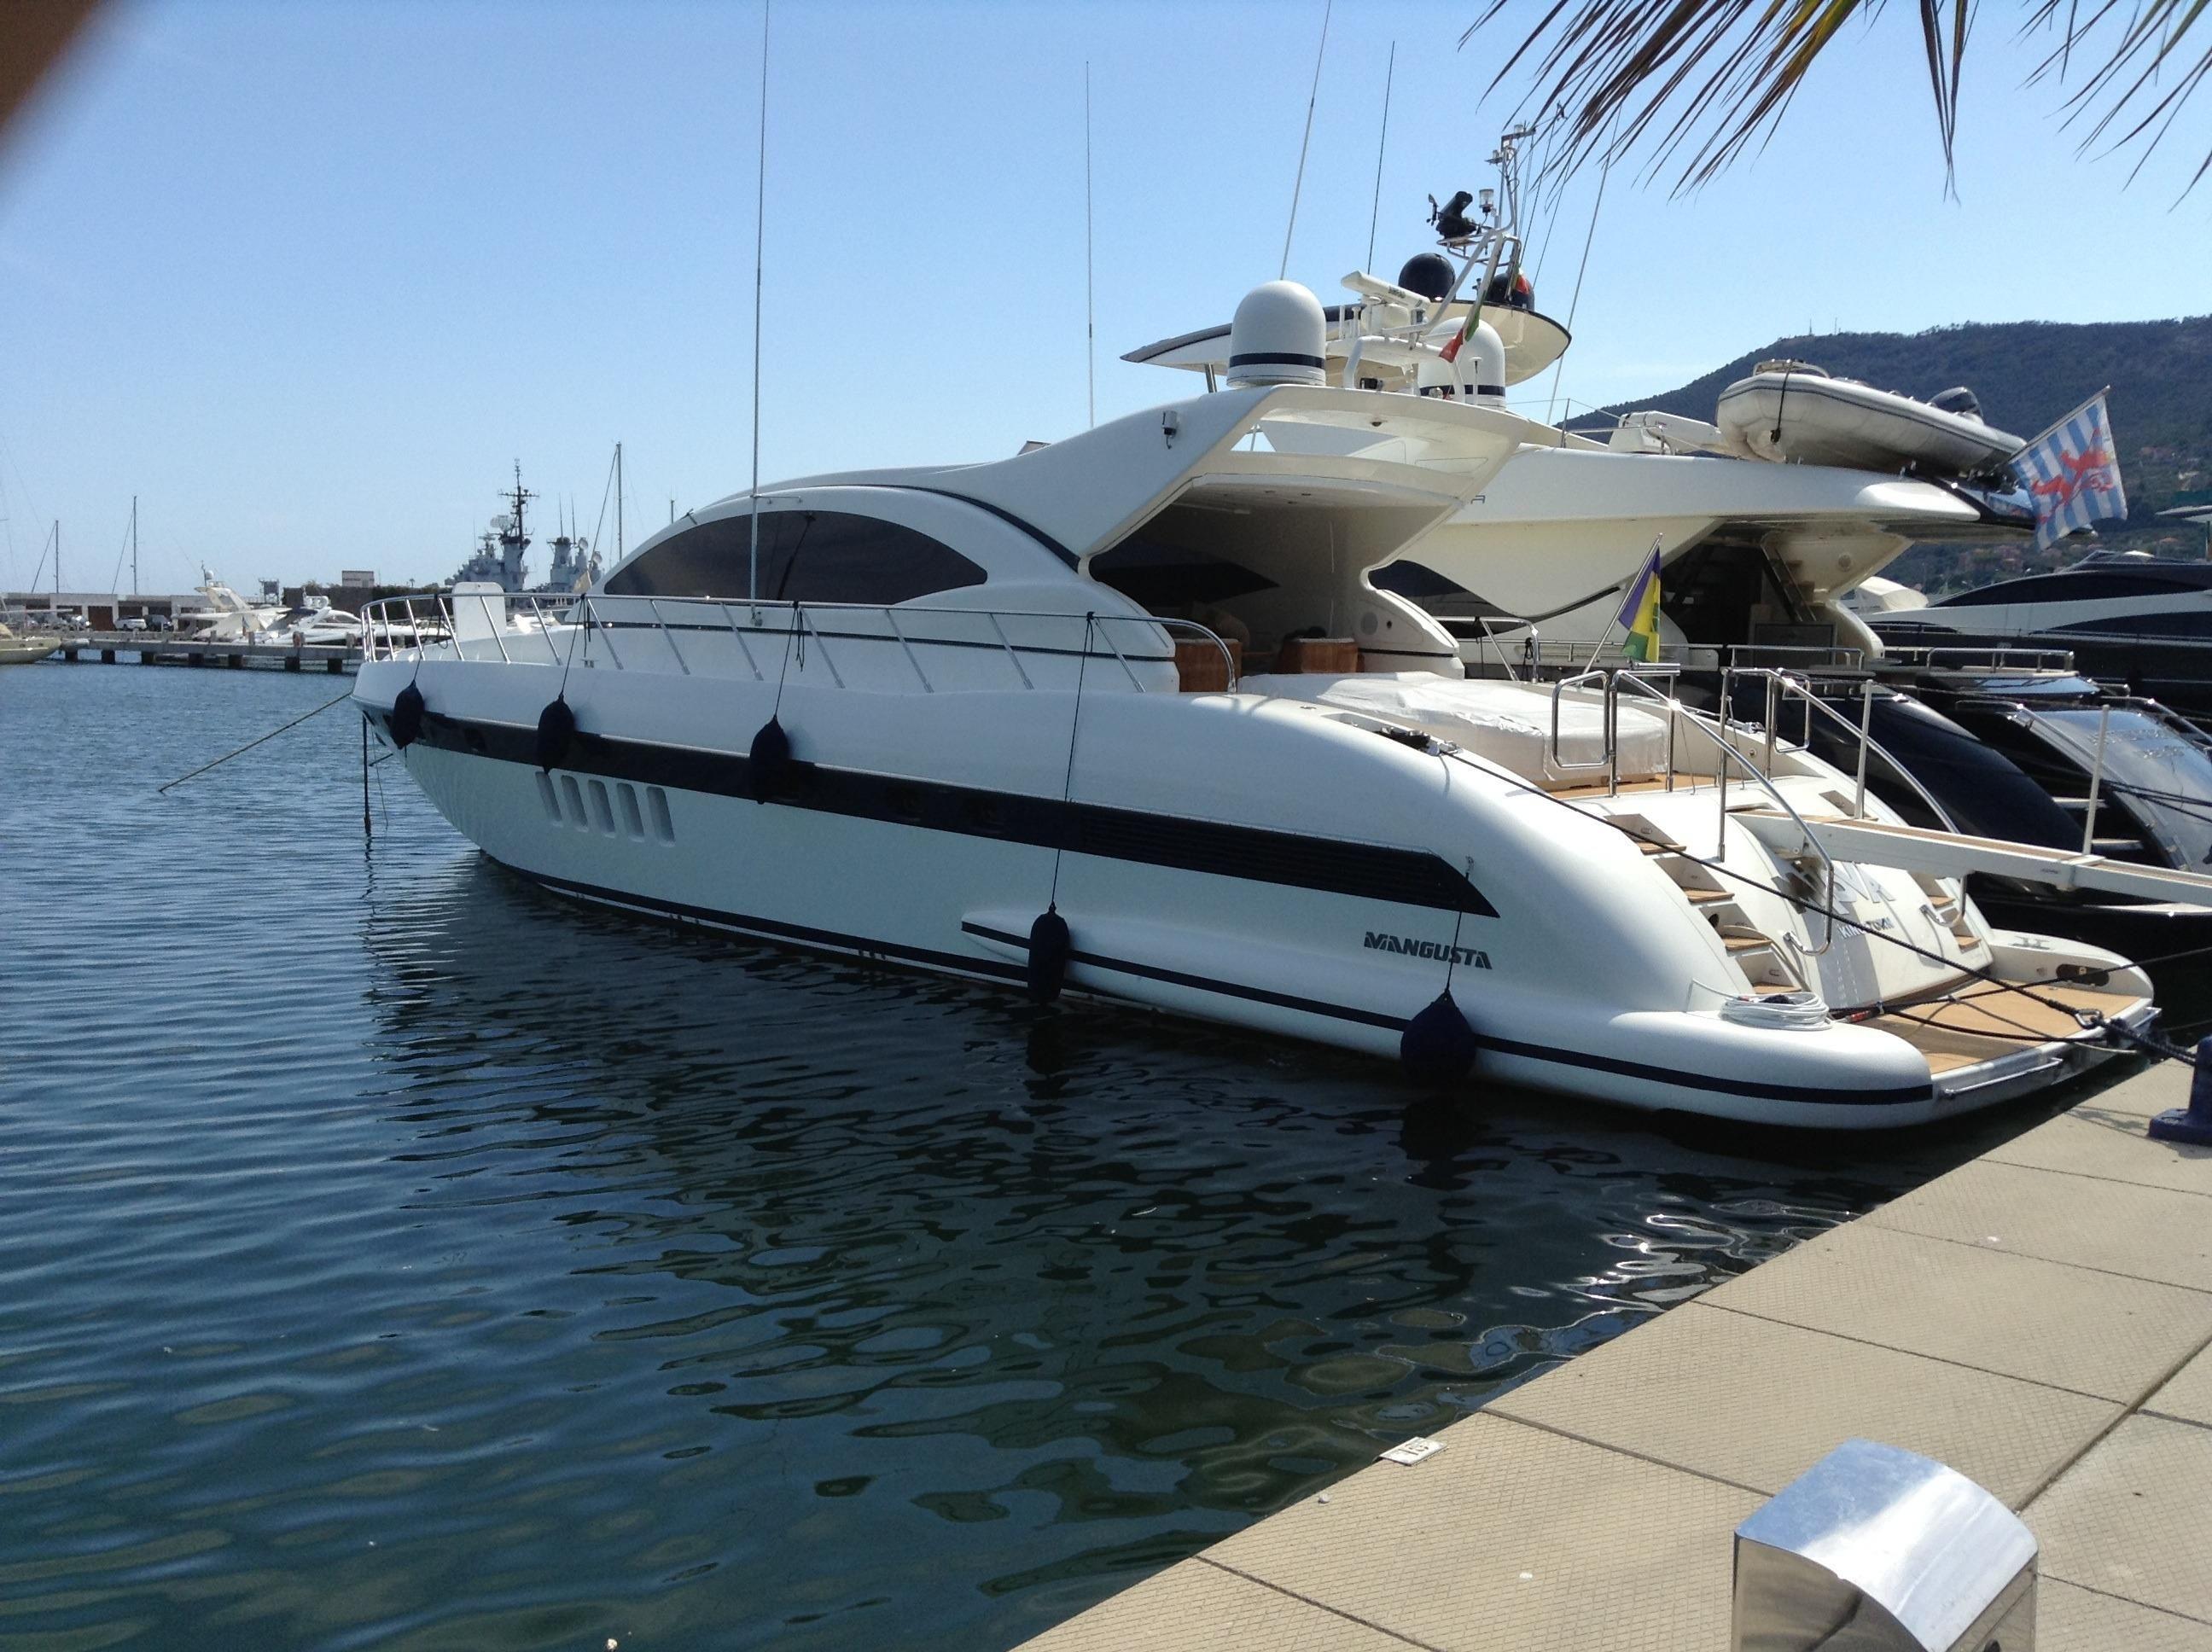 2003 overmarine mangusta 72 power boat for sale www for Johnson marine italia